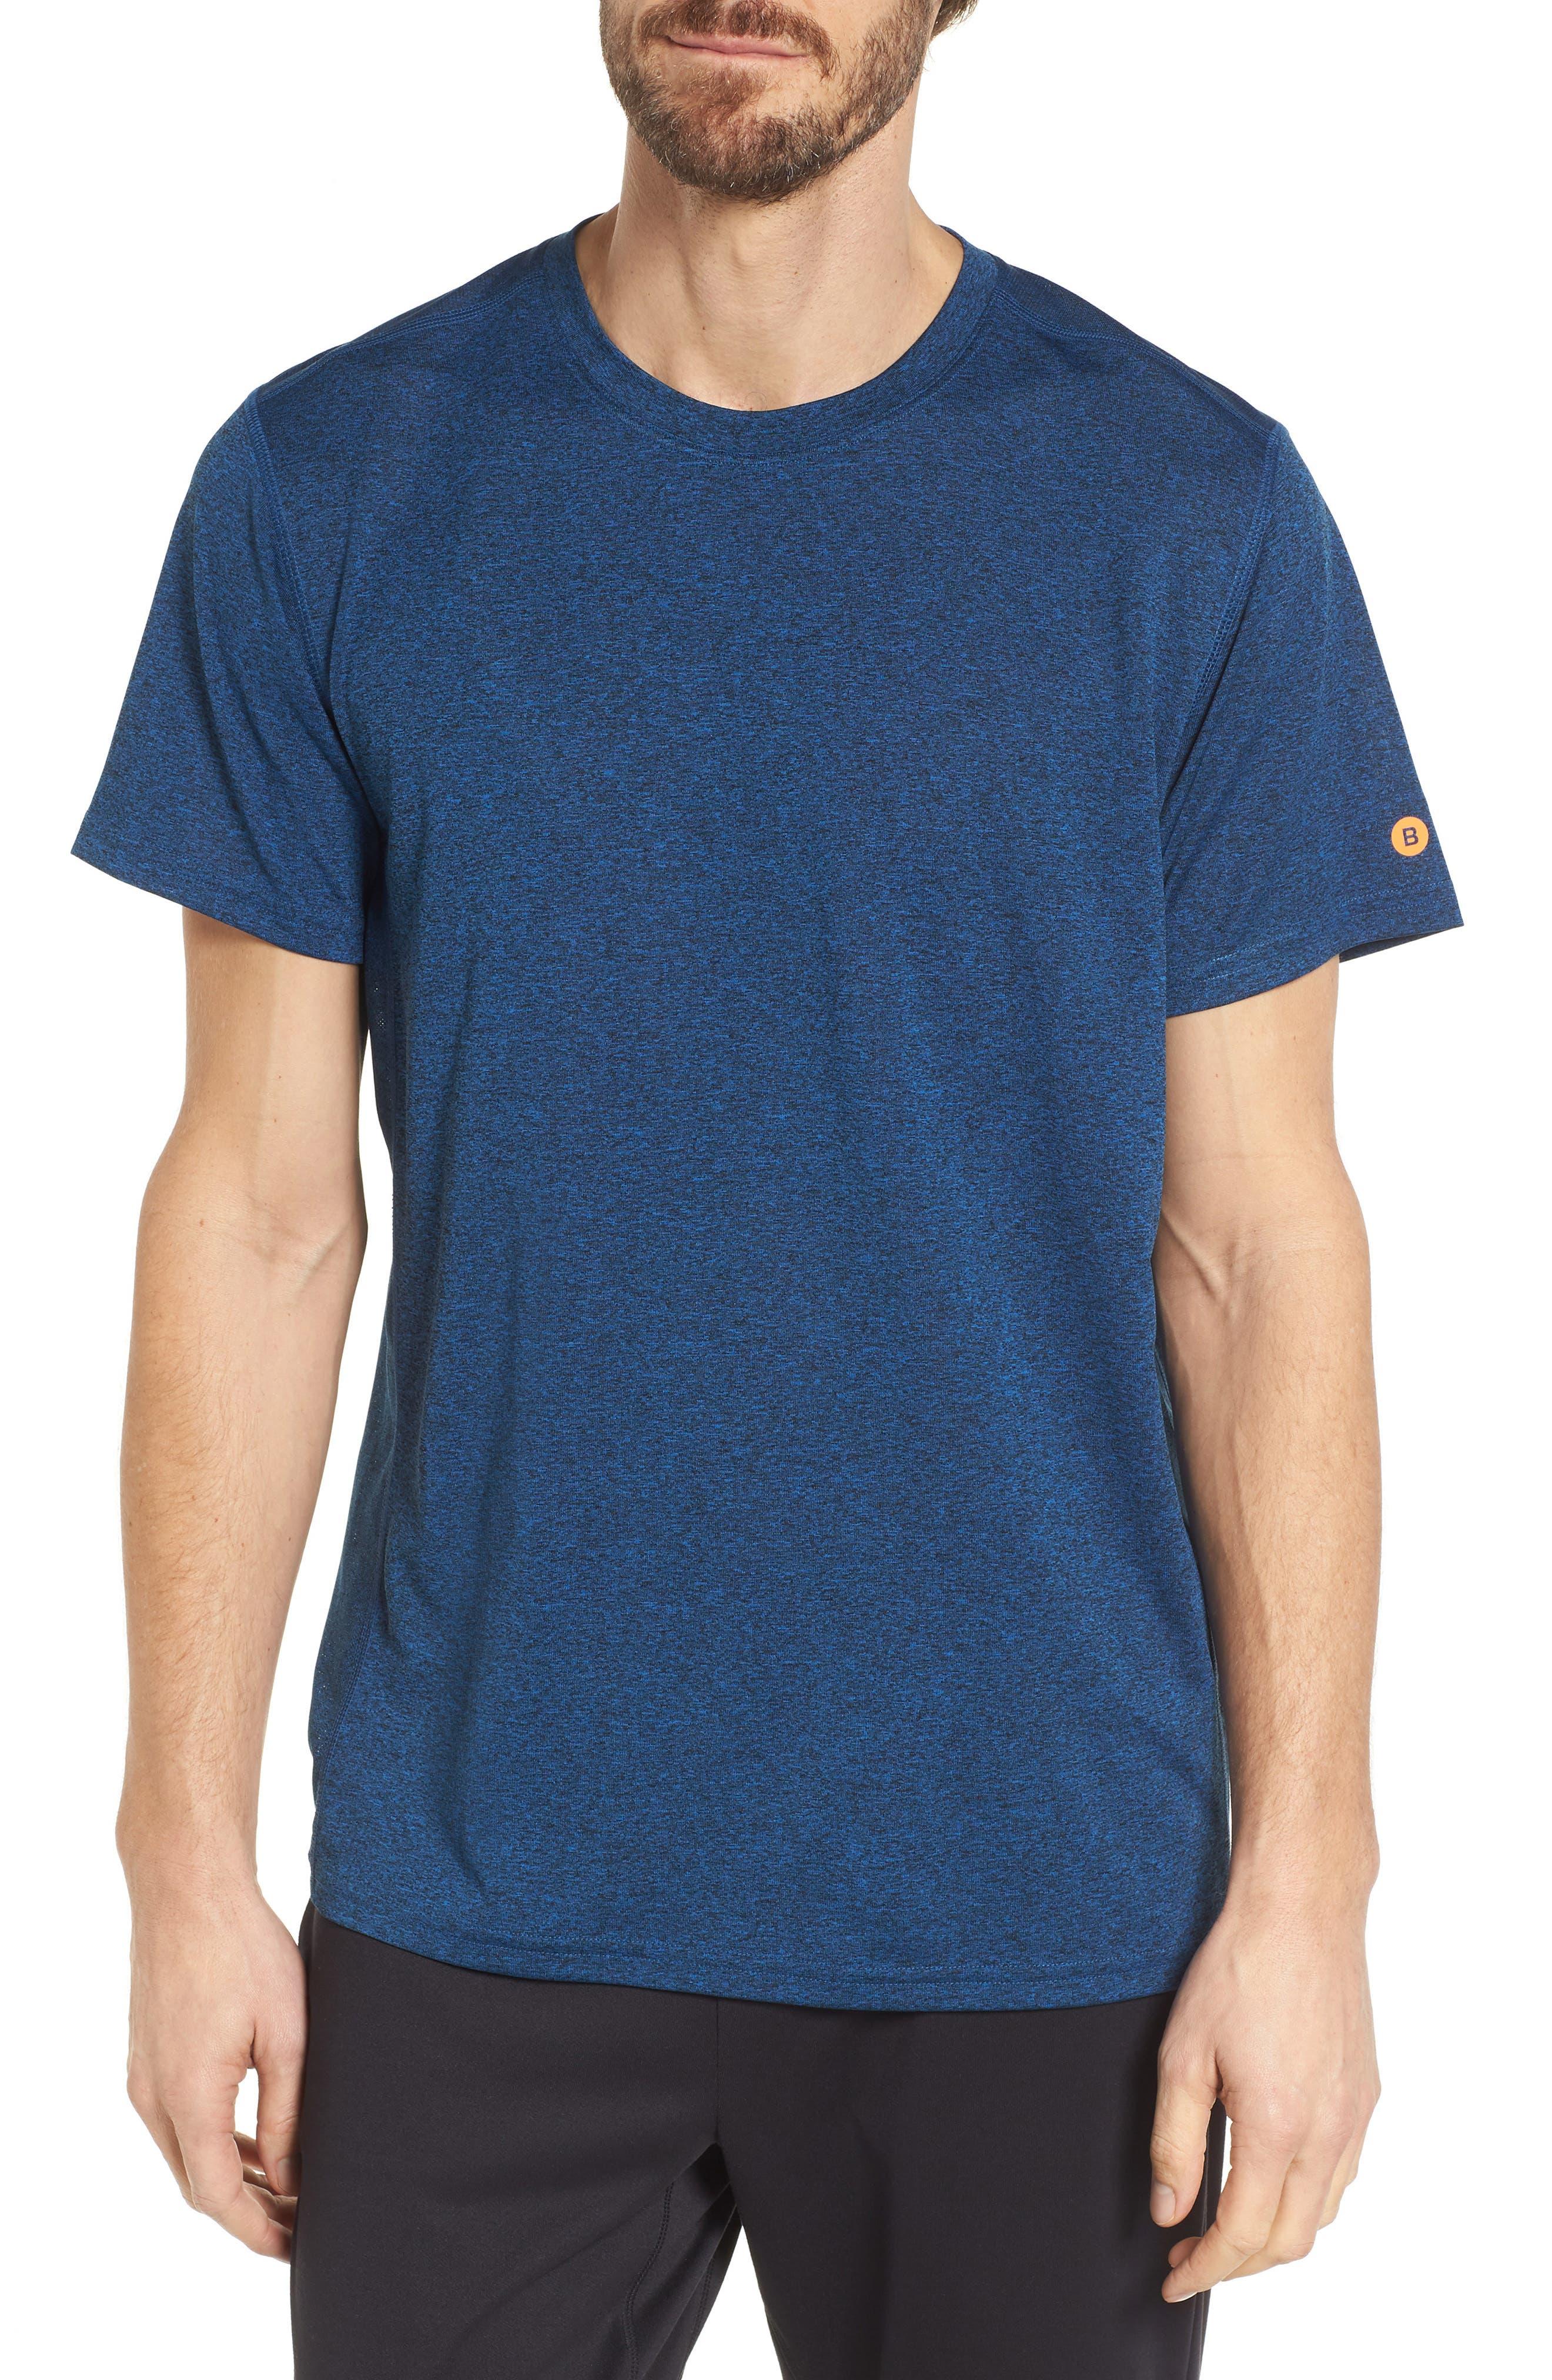 Goodsport Mesh Panel T-Shirt,                         Main,                         color, Lapis Blue/ Black Heather